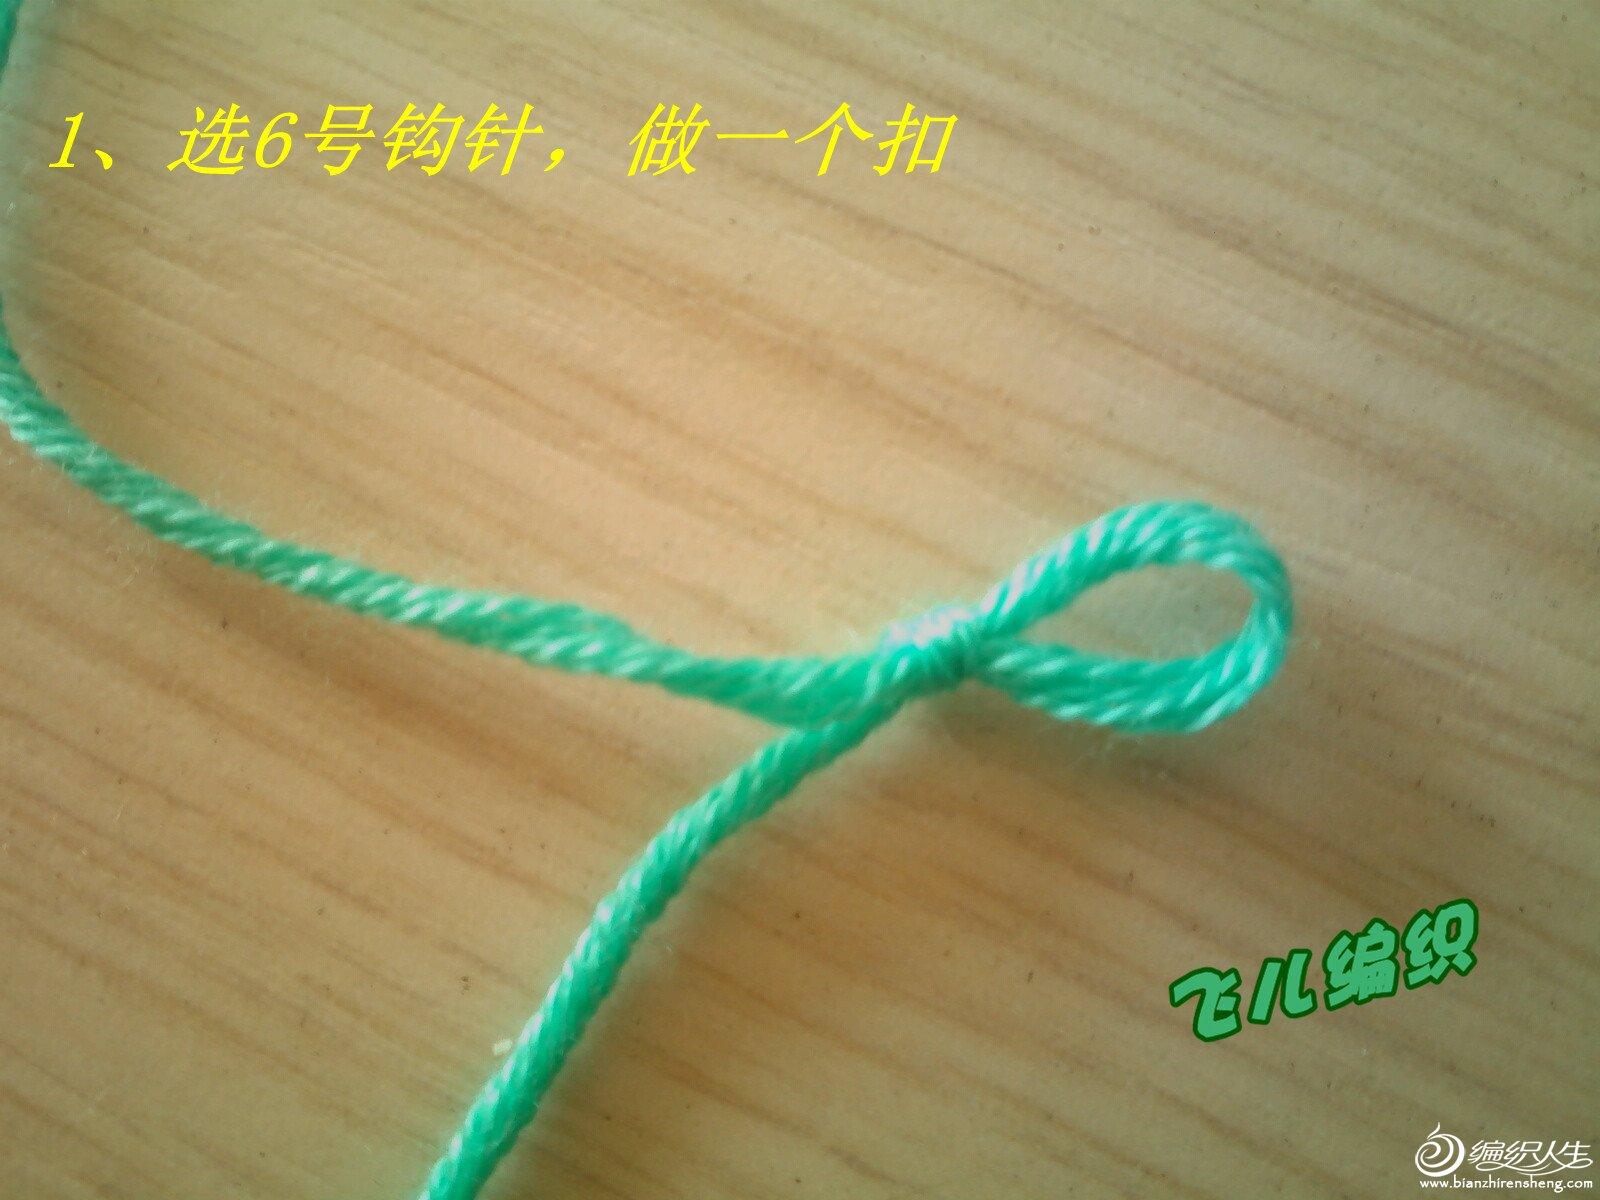 IMG1508_副本.jpg